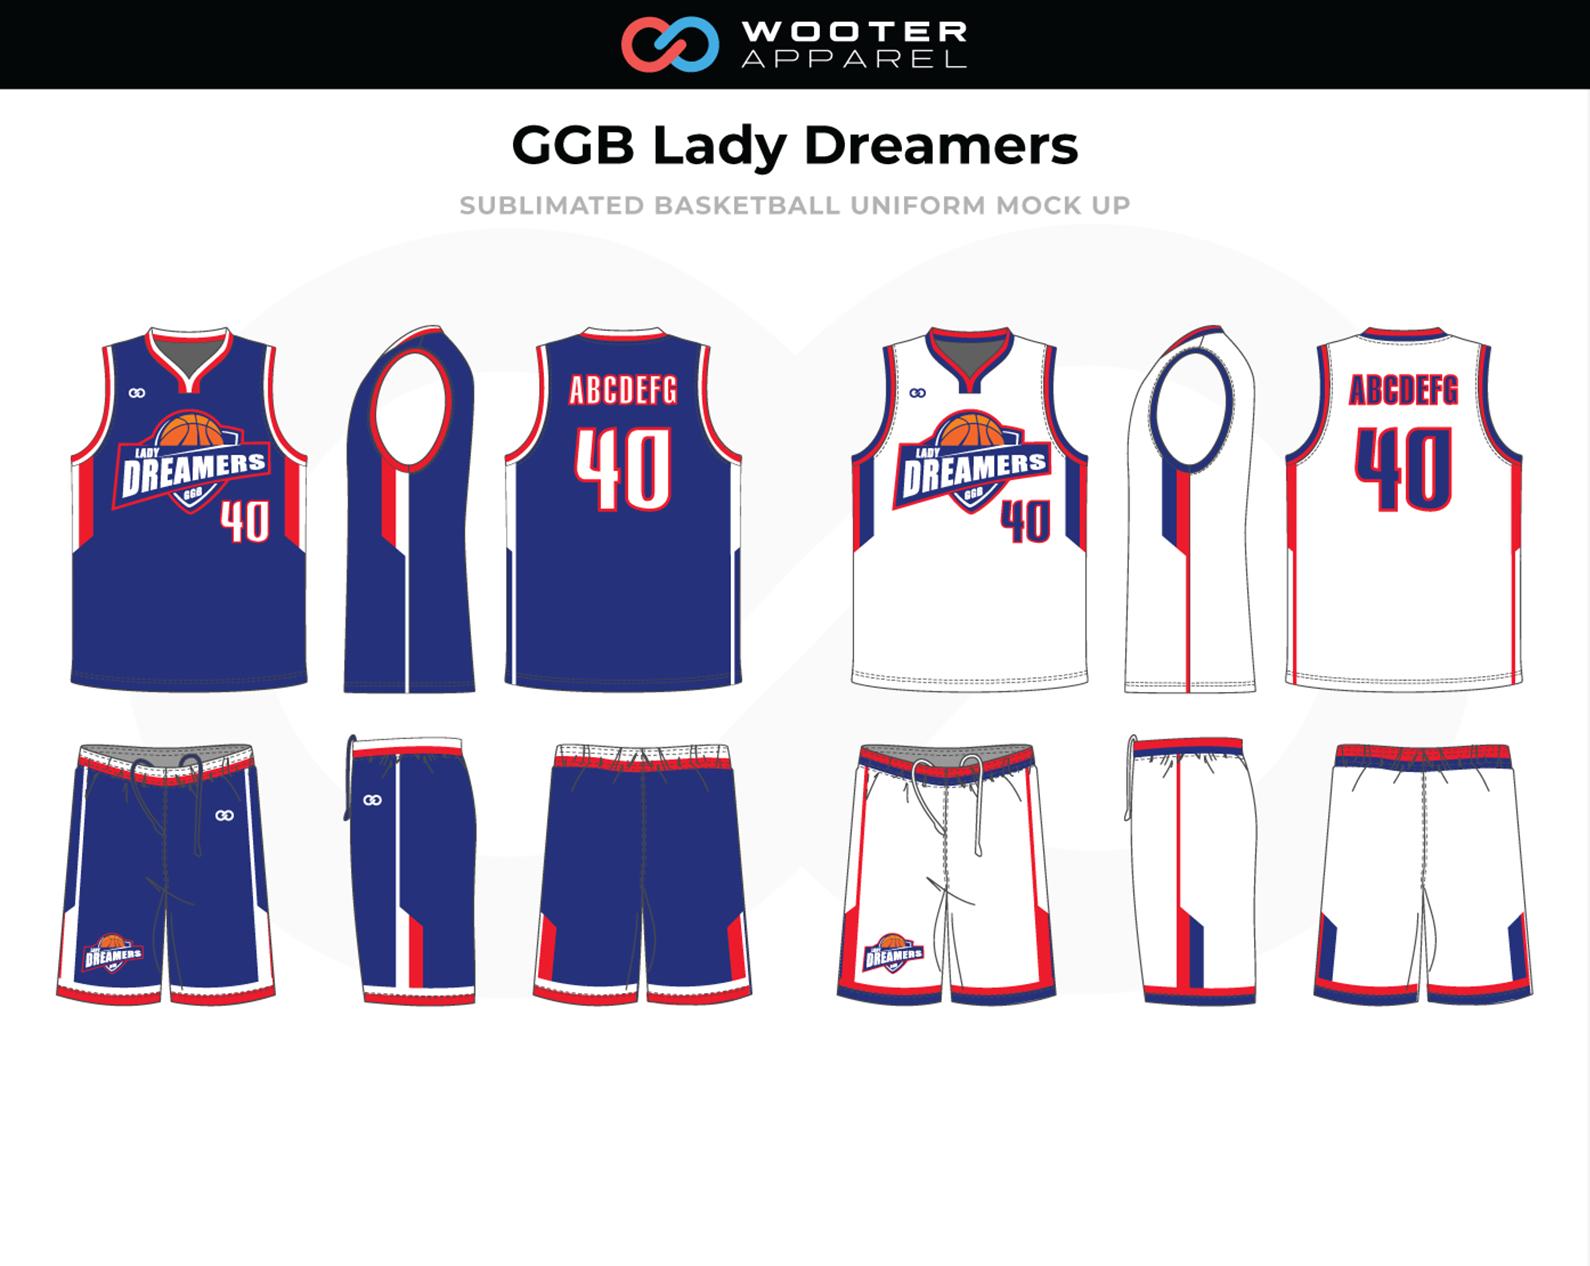 GGB-Lady-Dreamers-Sublimated-Basketball-Uniform-Mock-Up_v1_2018.png